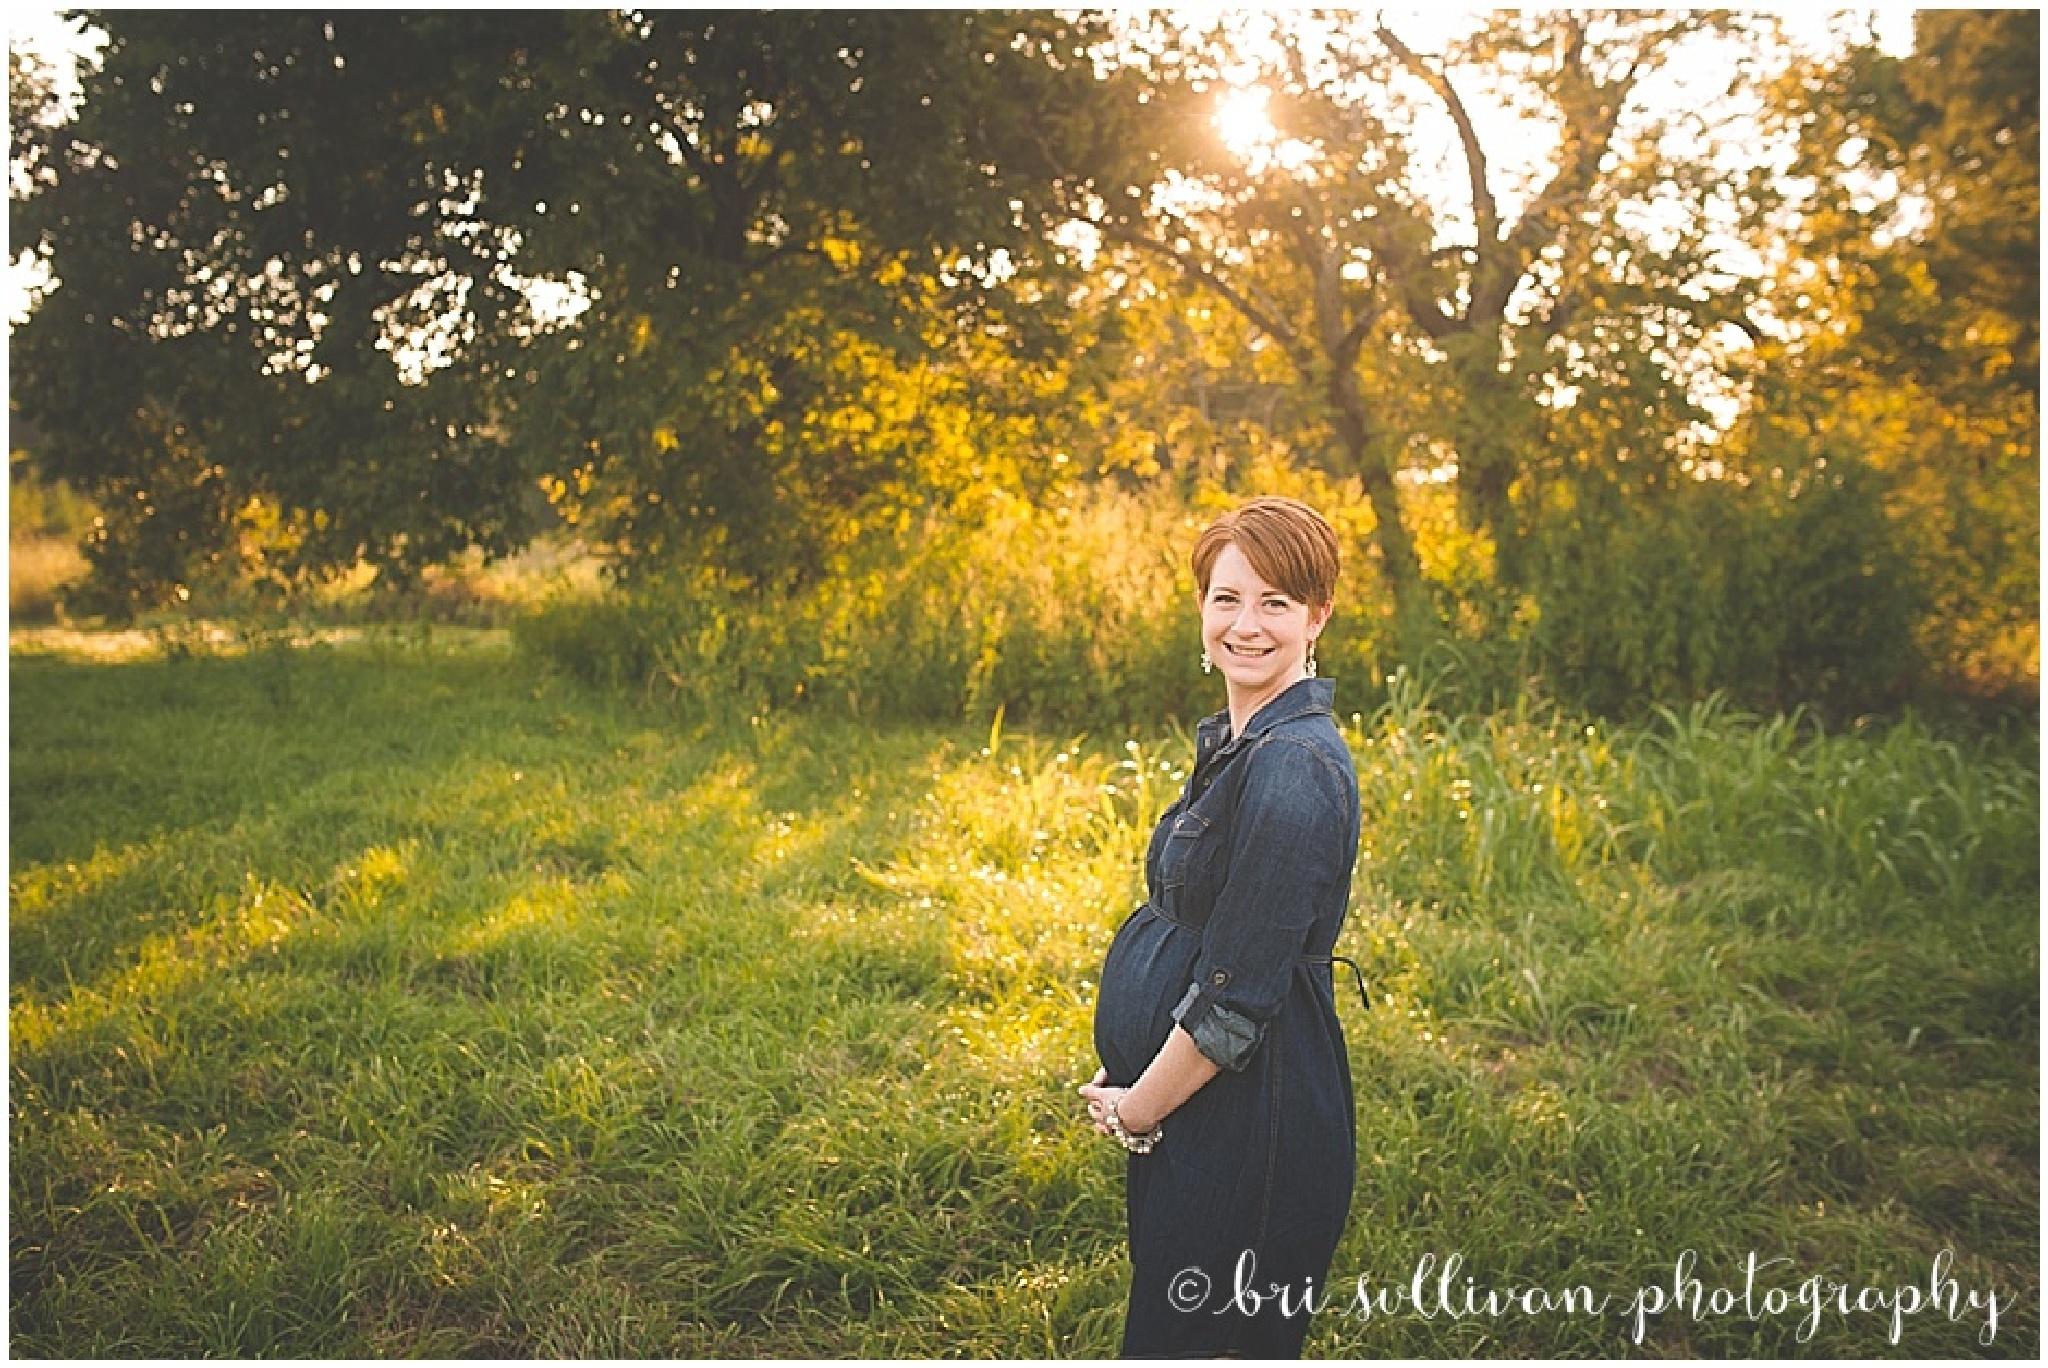 Houston Maternity Photography by cherrystreetphoto